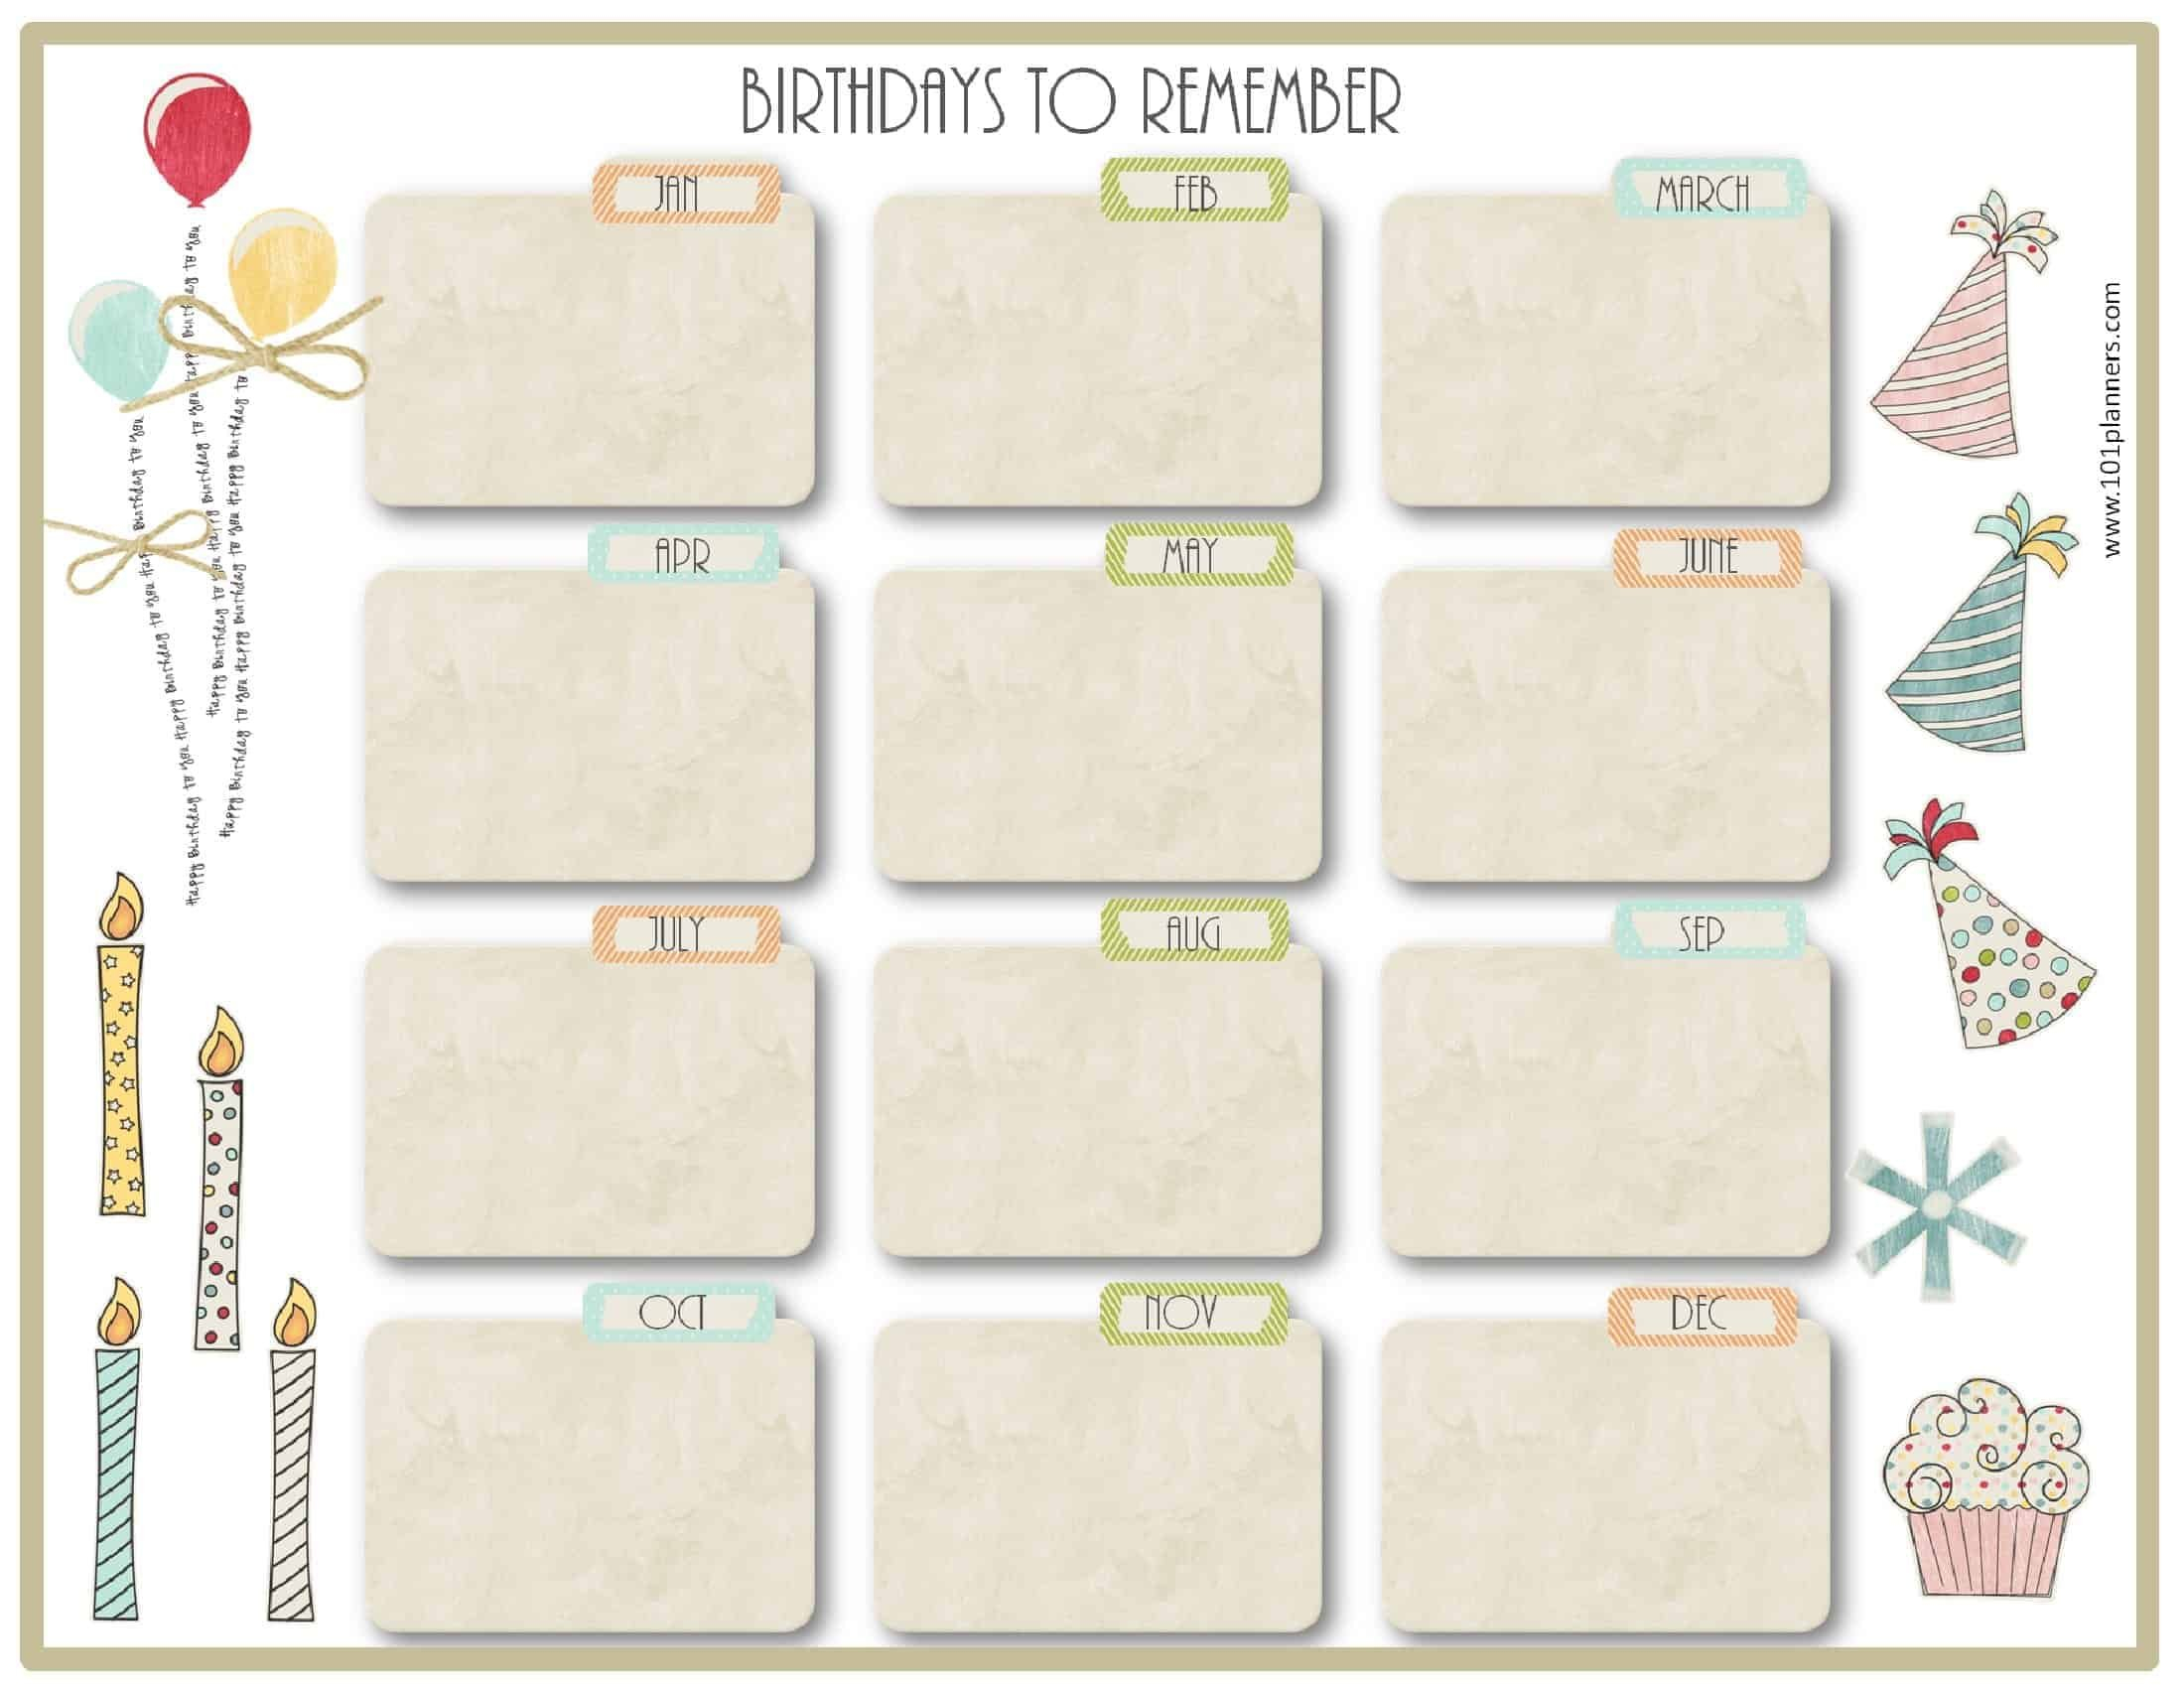 Birthday Calendar Template Birthday Calendar Fill In Online